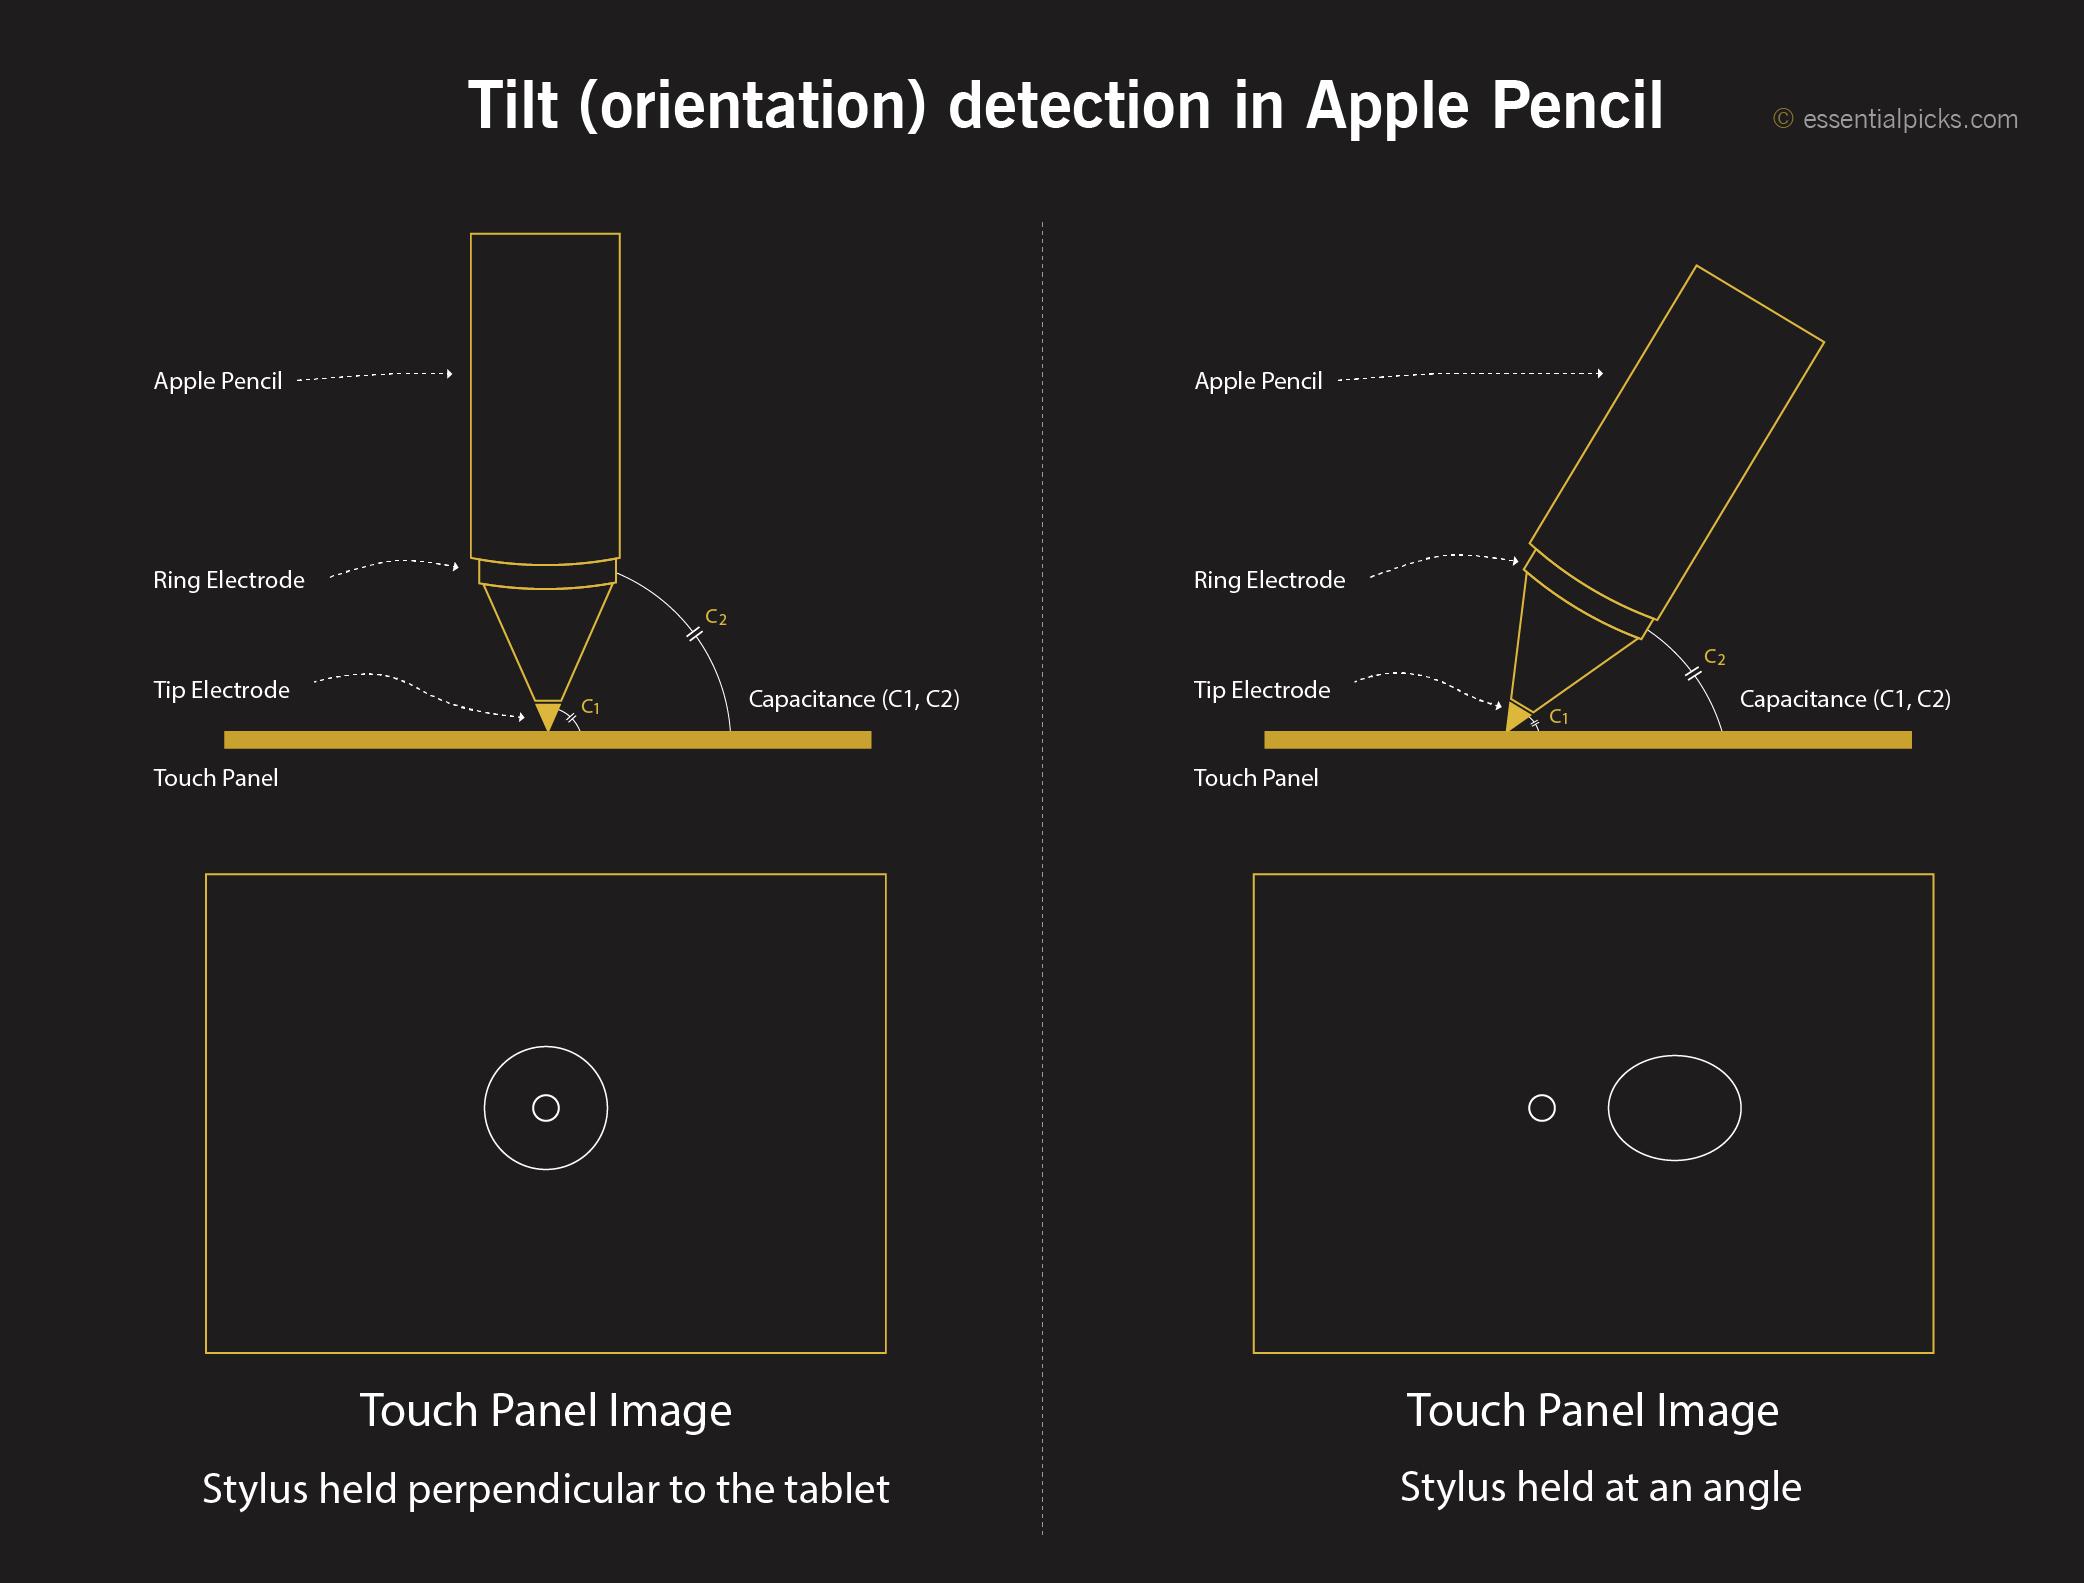 tilt detection in Apple Pencil